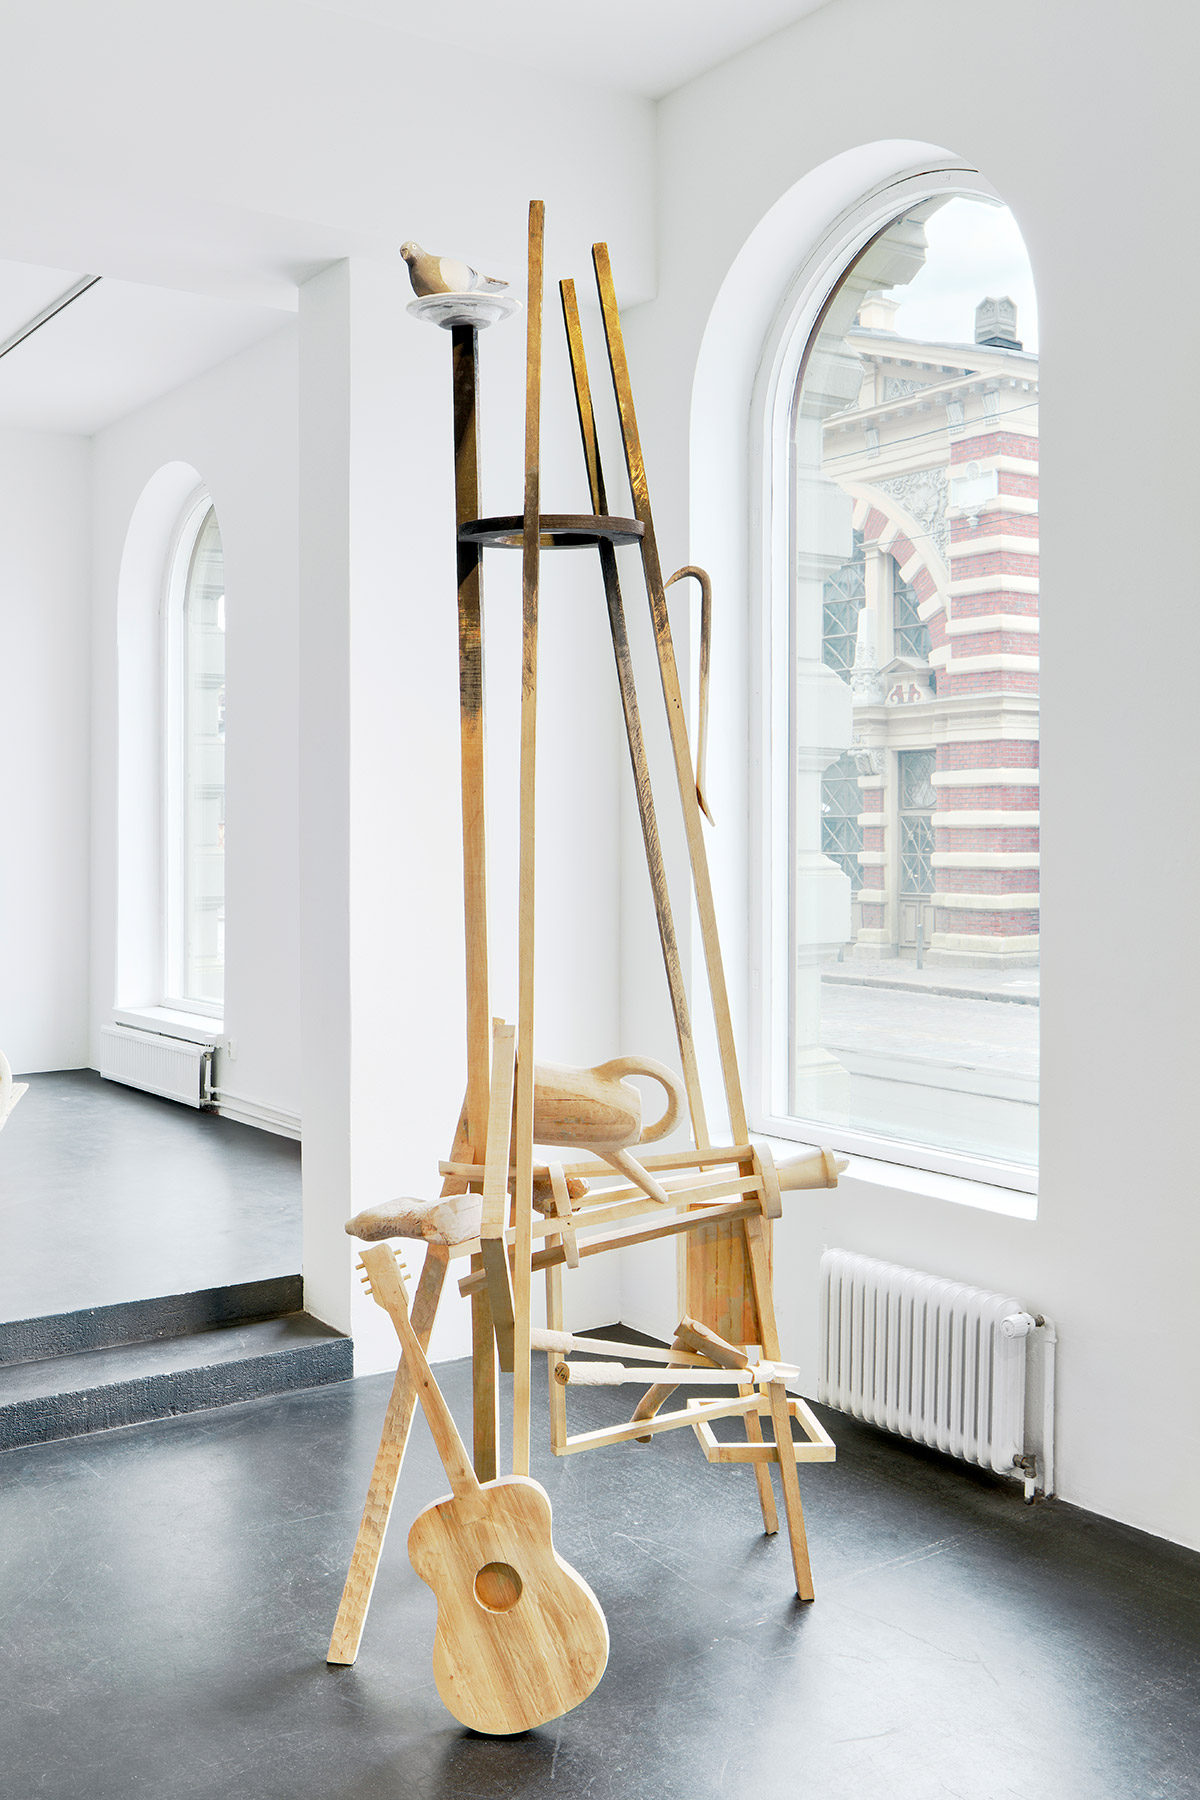 Galleria-Sculptor-Anneli-Sipilainen-ja-Liisa-Hilasvuori-Duo-4-©-Titus-Verhe